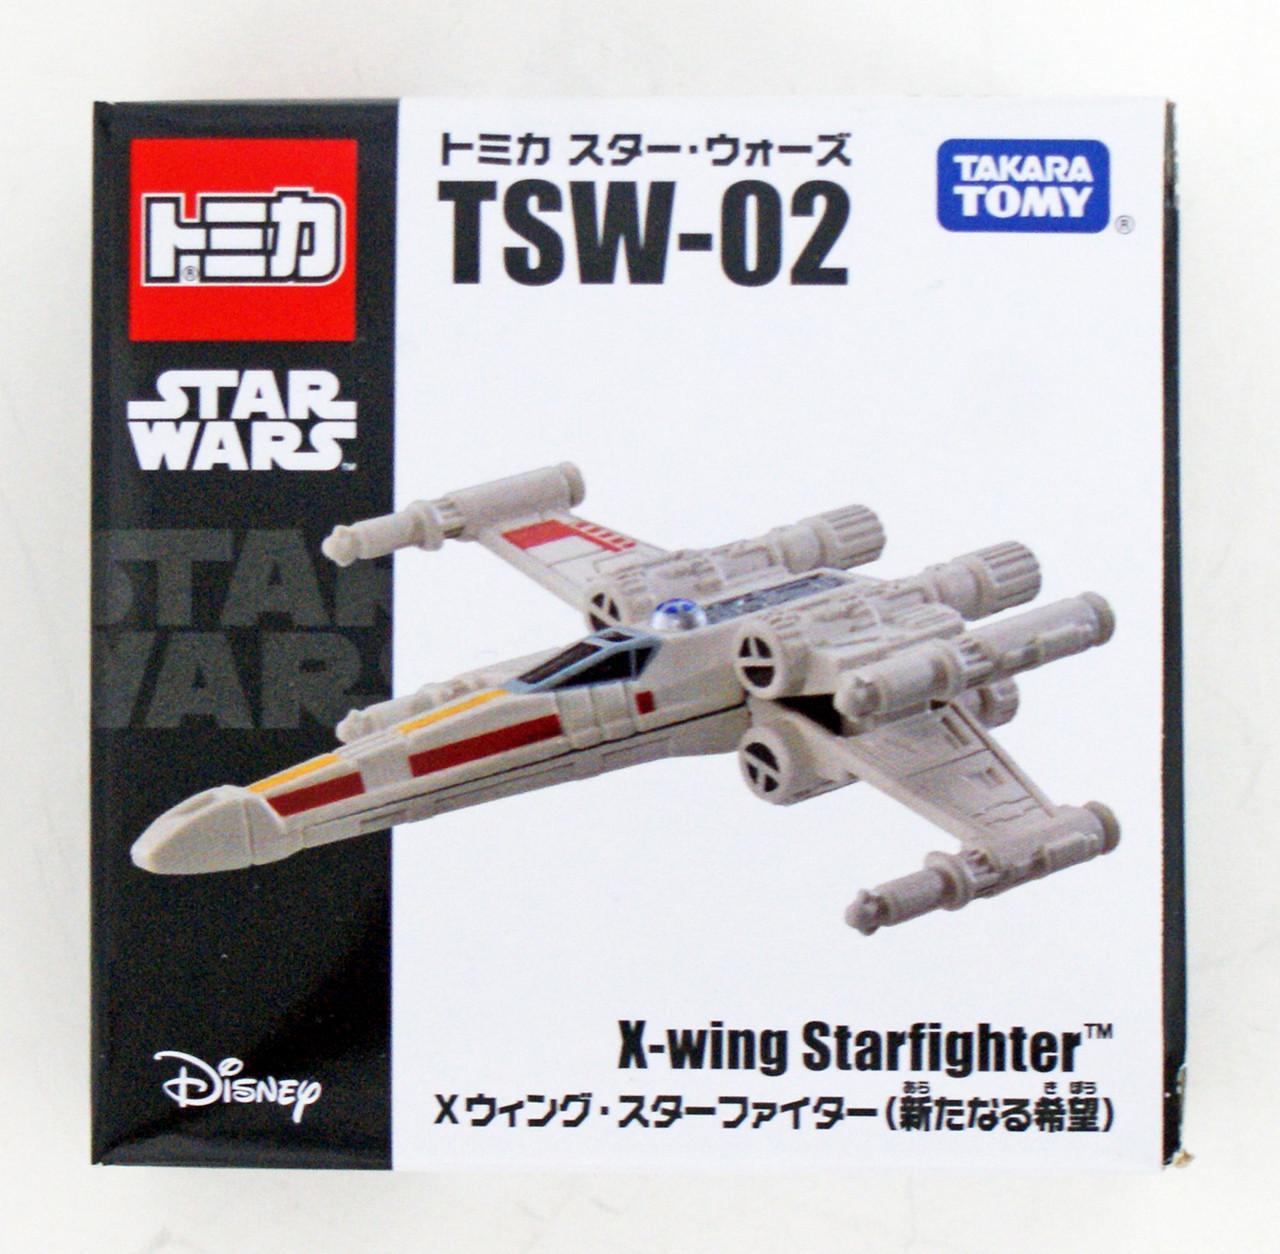 Takara Tomy Tomica Star Wars SC-05 Star Cars Darth Maul V8-M 118923